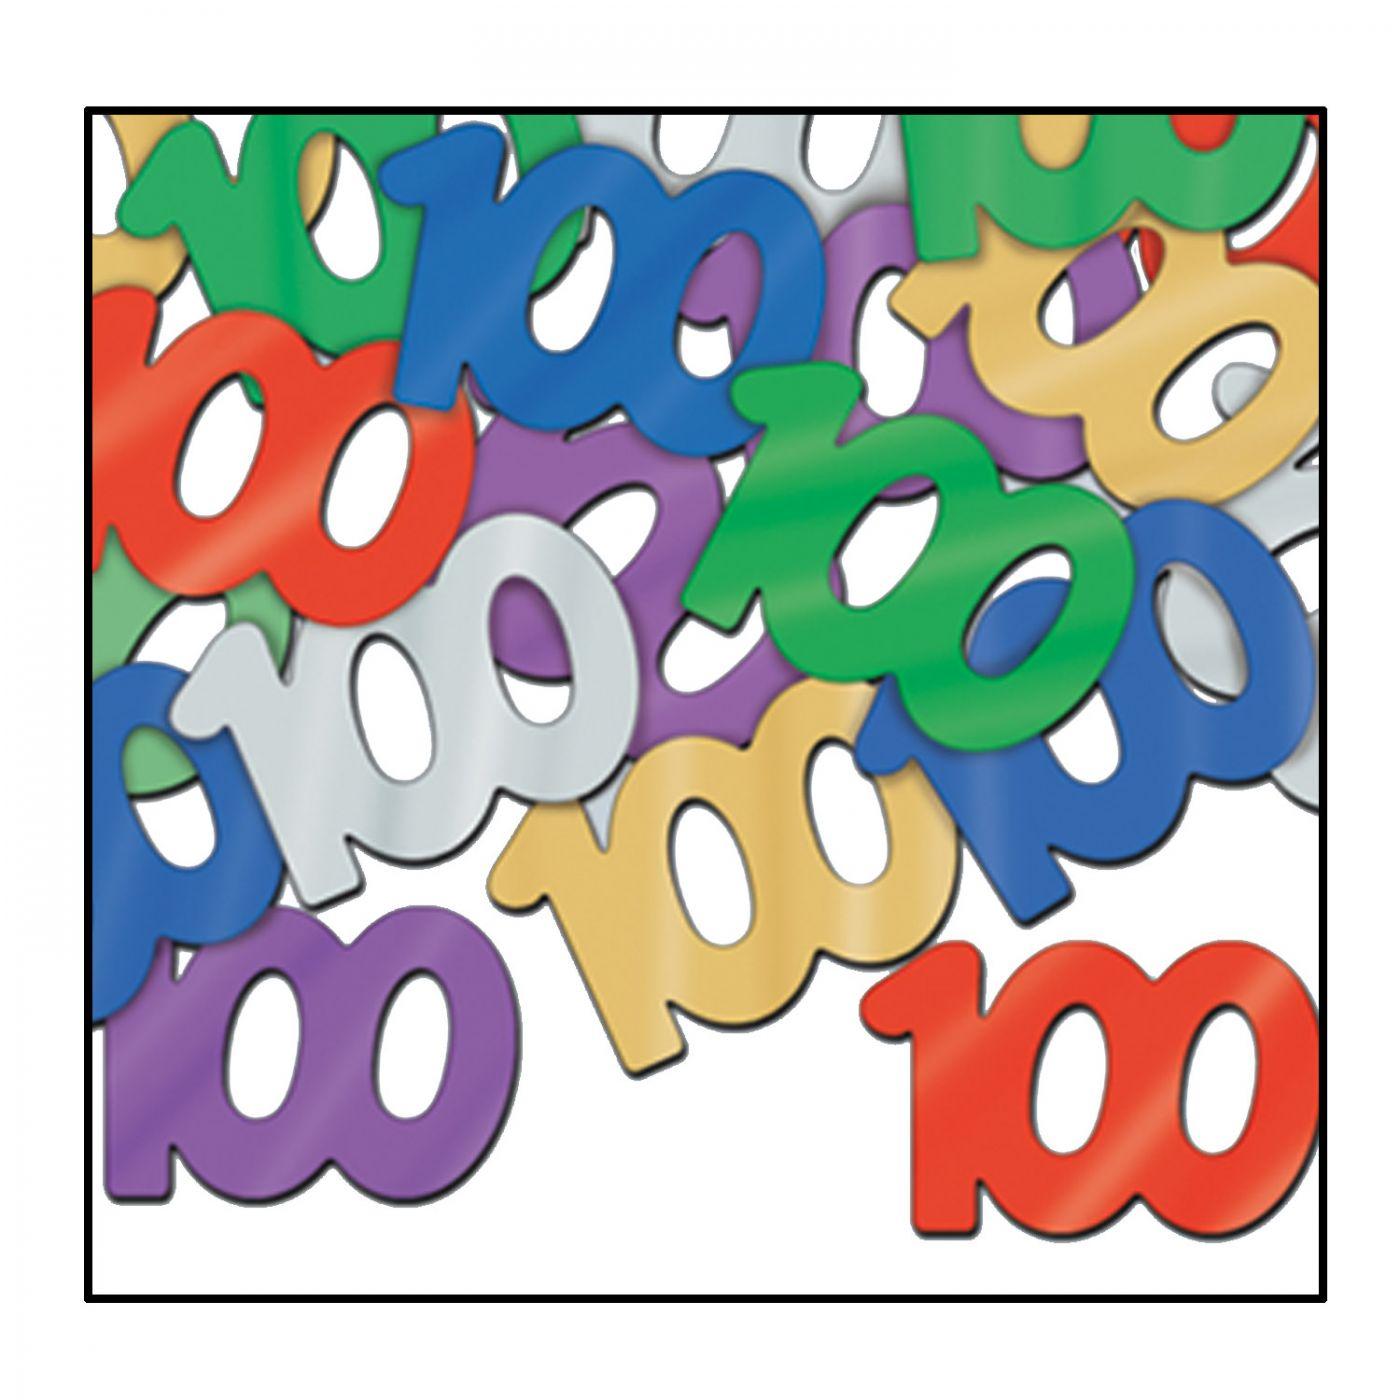 Fanci-Fetti  100  Silhouettes image